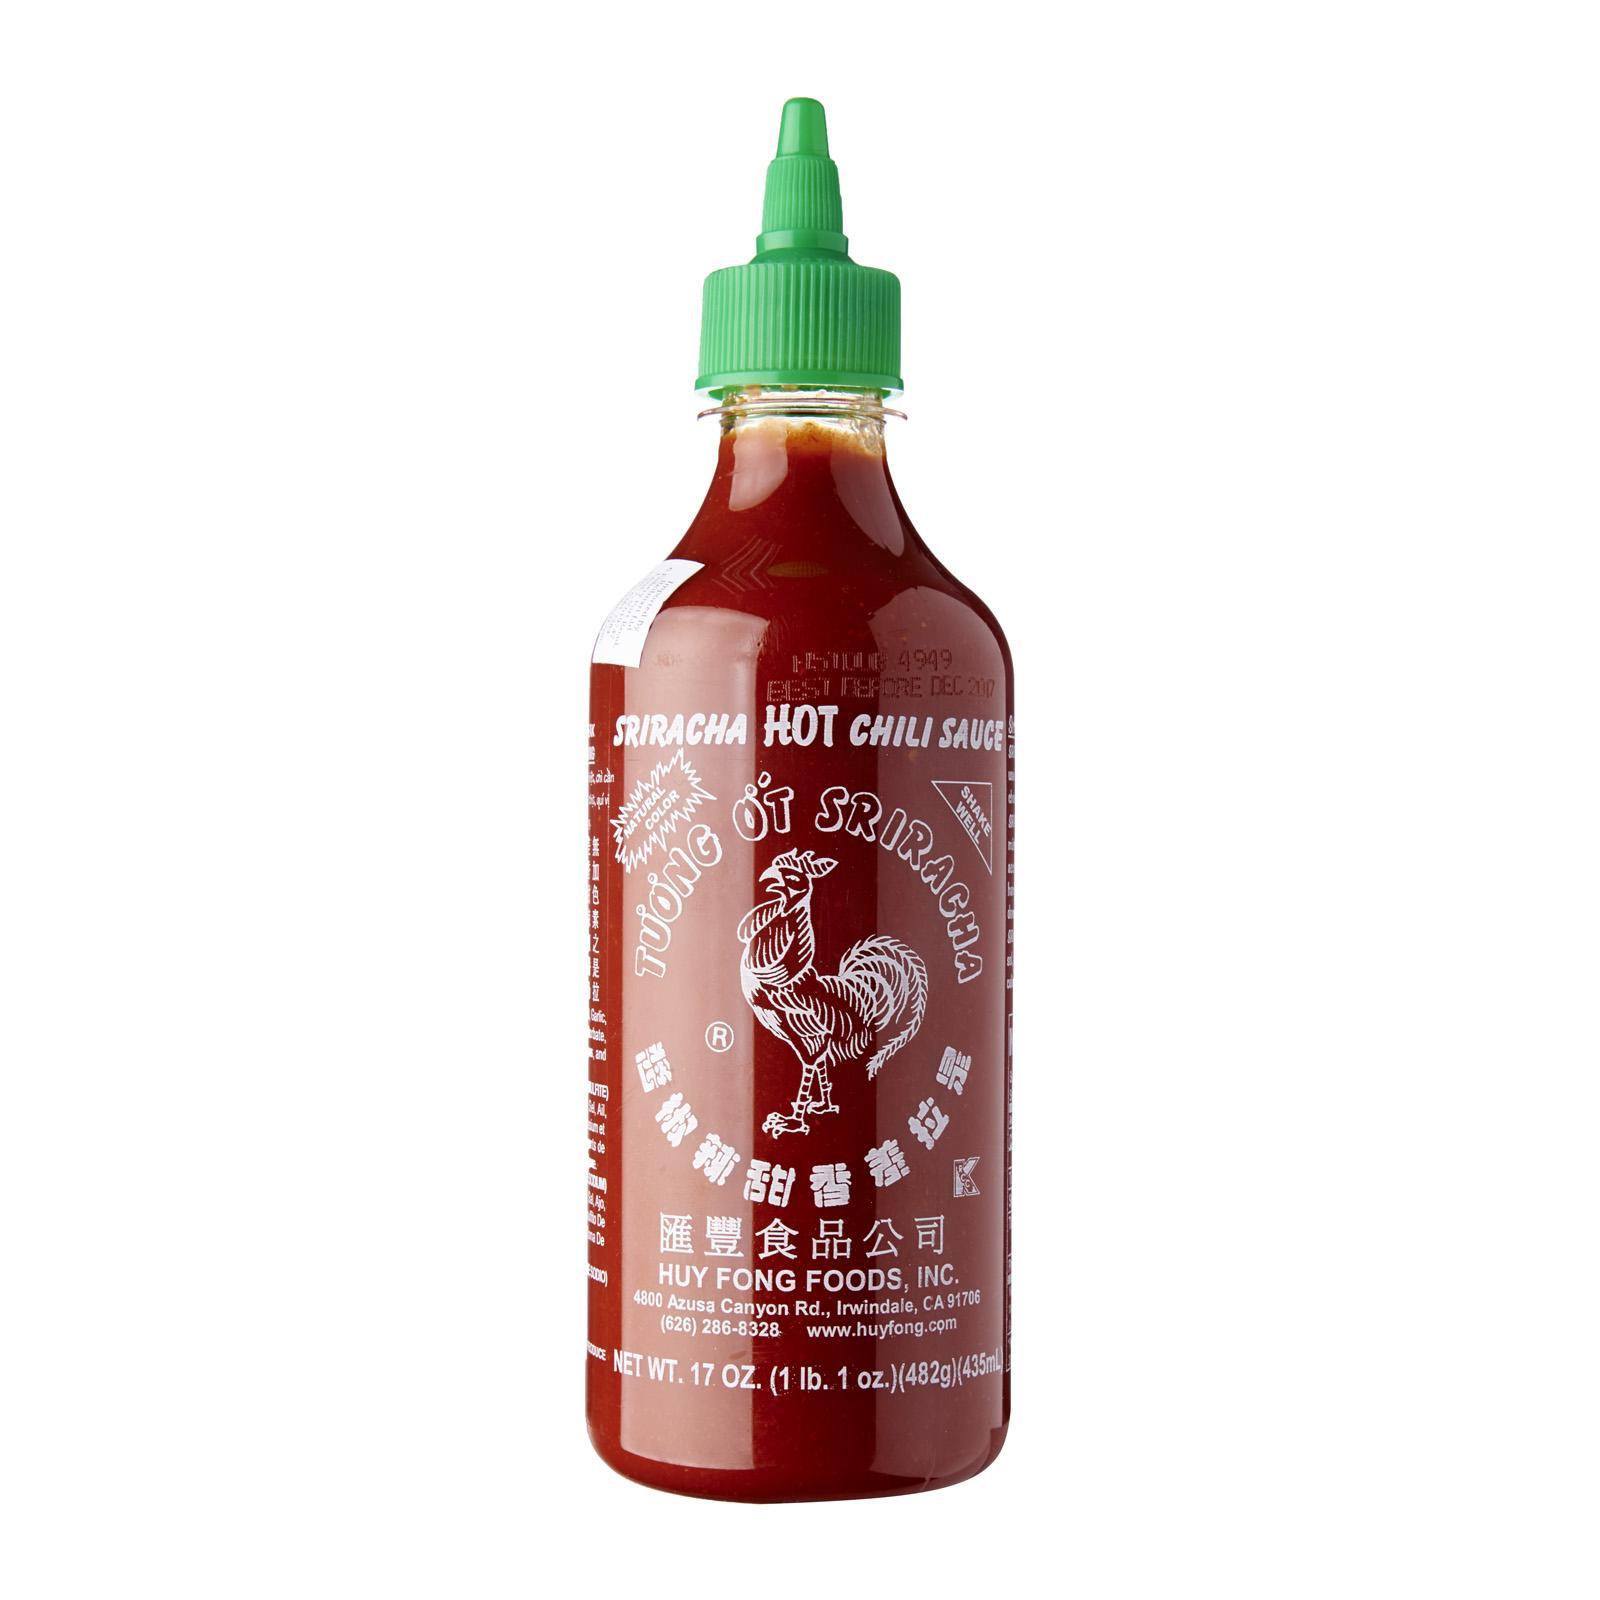 Huy Fong Sriracha Hot Chili Sauce Aka Rooster Sauce (chili Sauce) By Redmart.